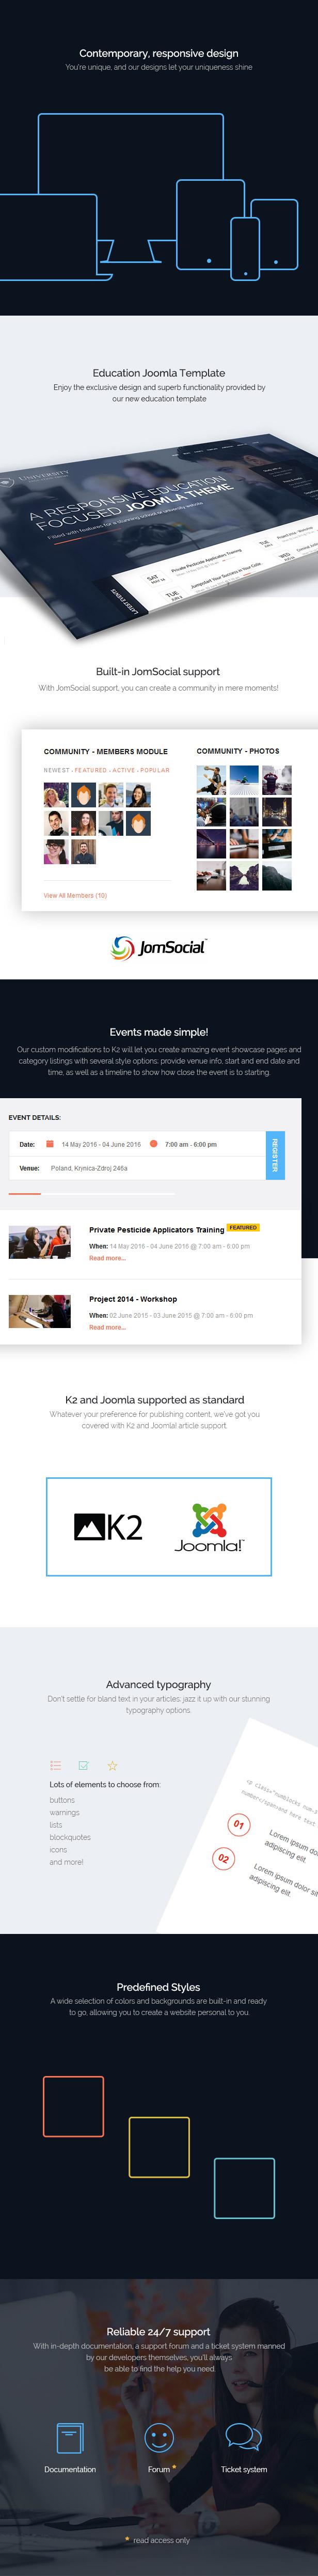 University - Joomla Education Template from GavickPro